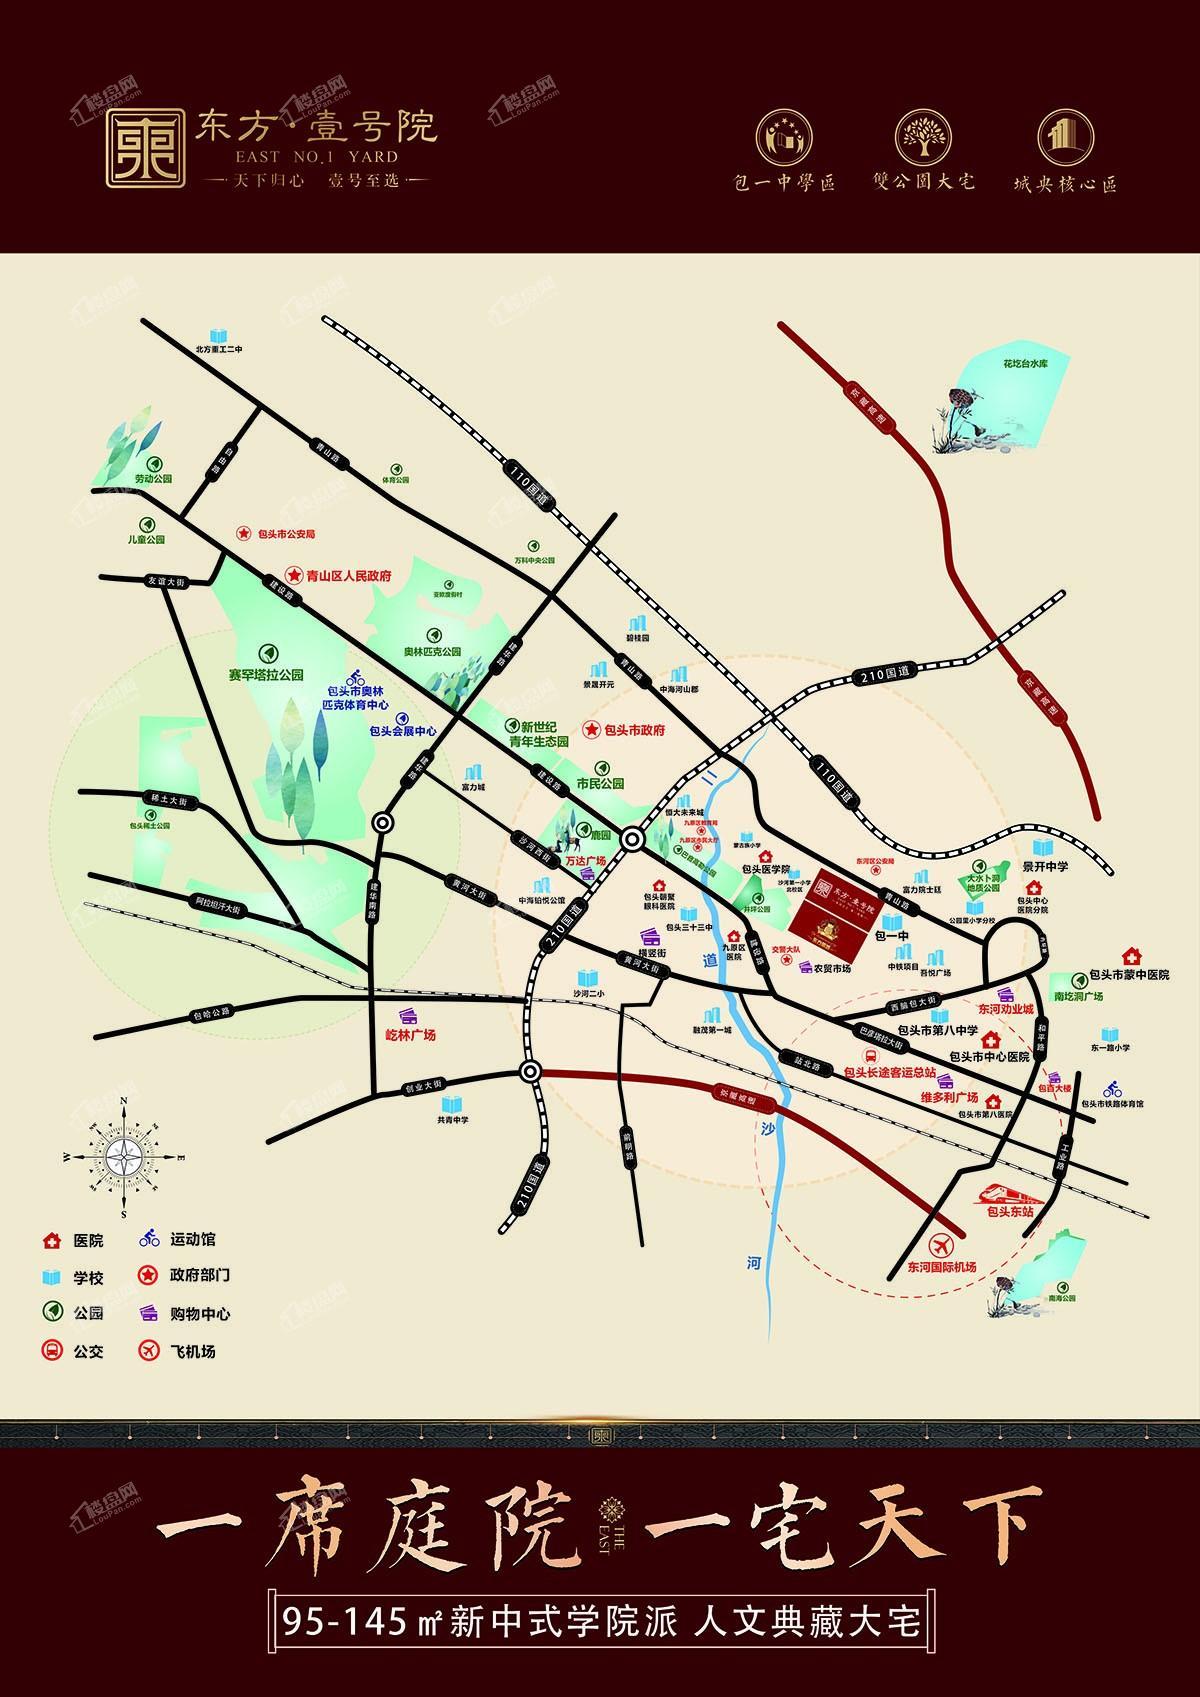 东方壹号院位置图